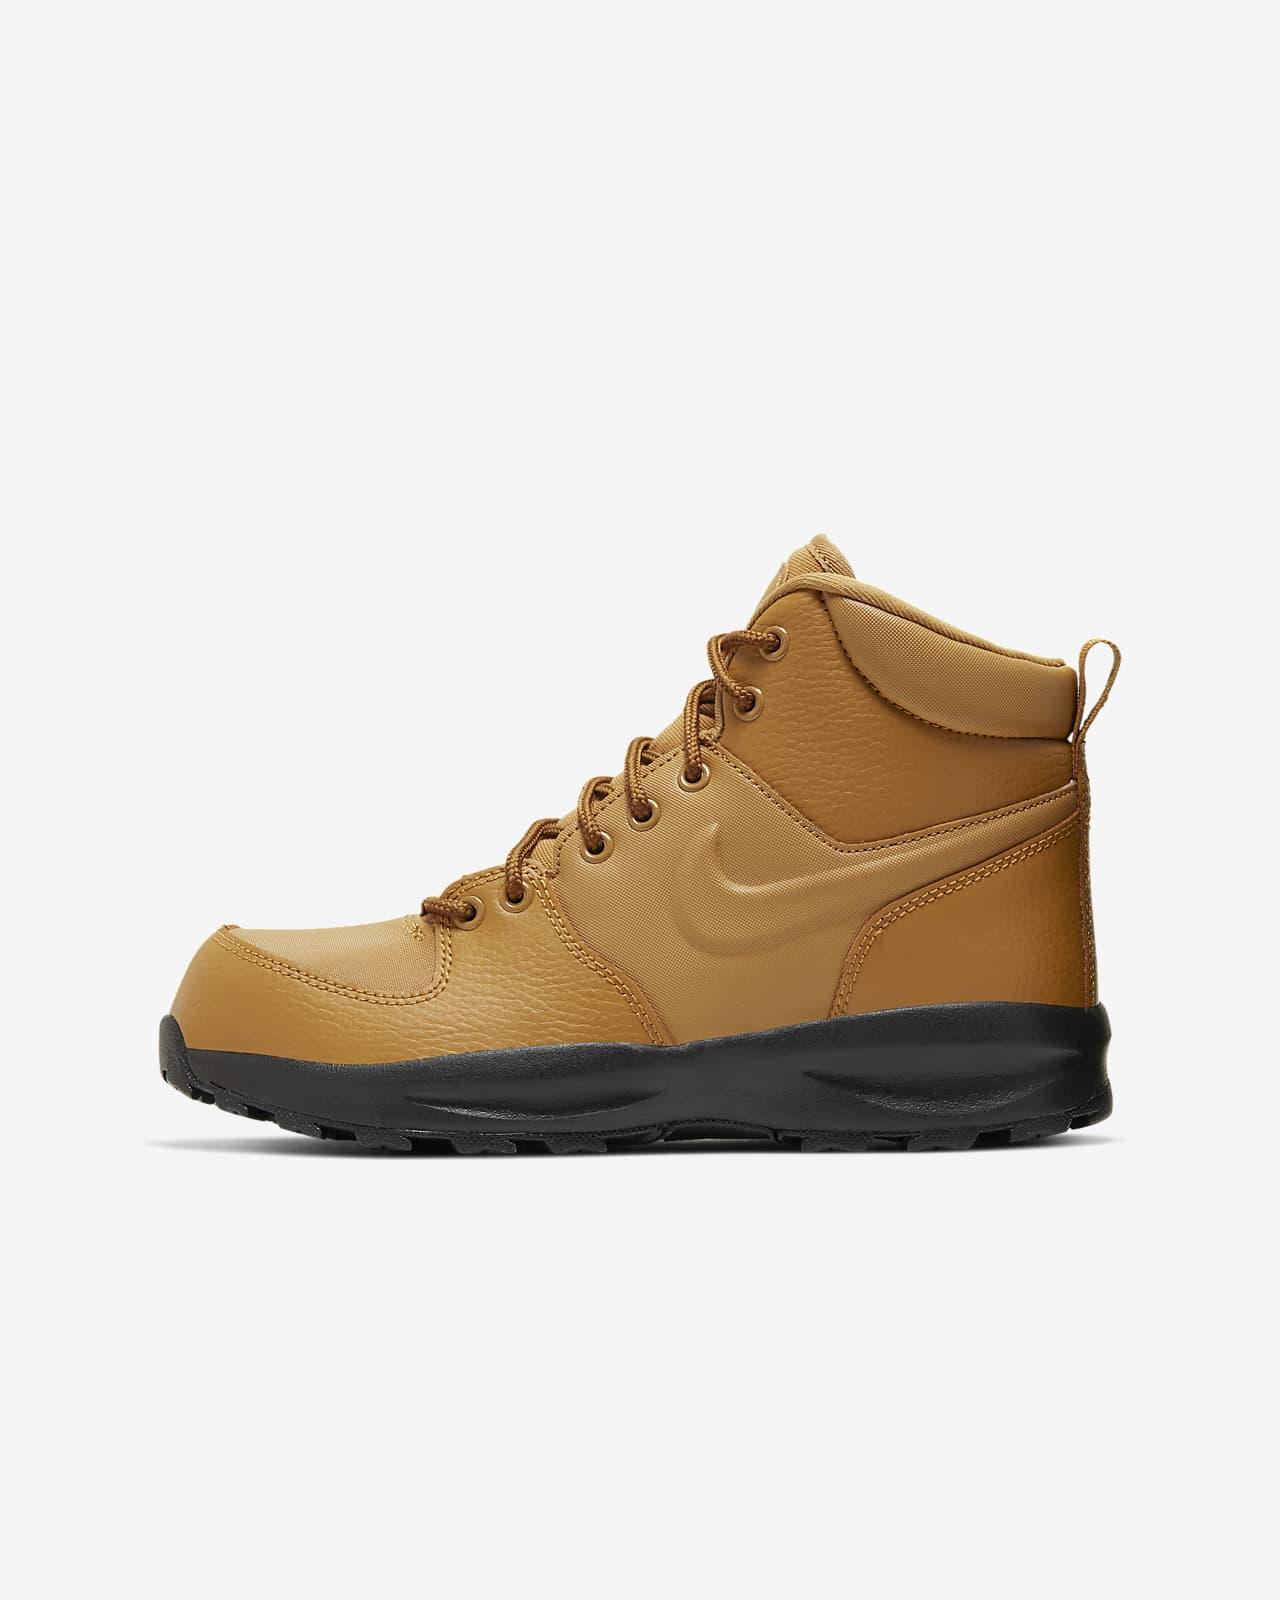 Nike Manoa LTR Older Kids' Boot